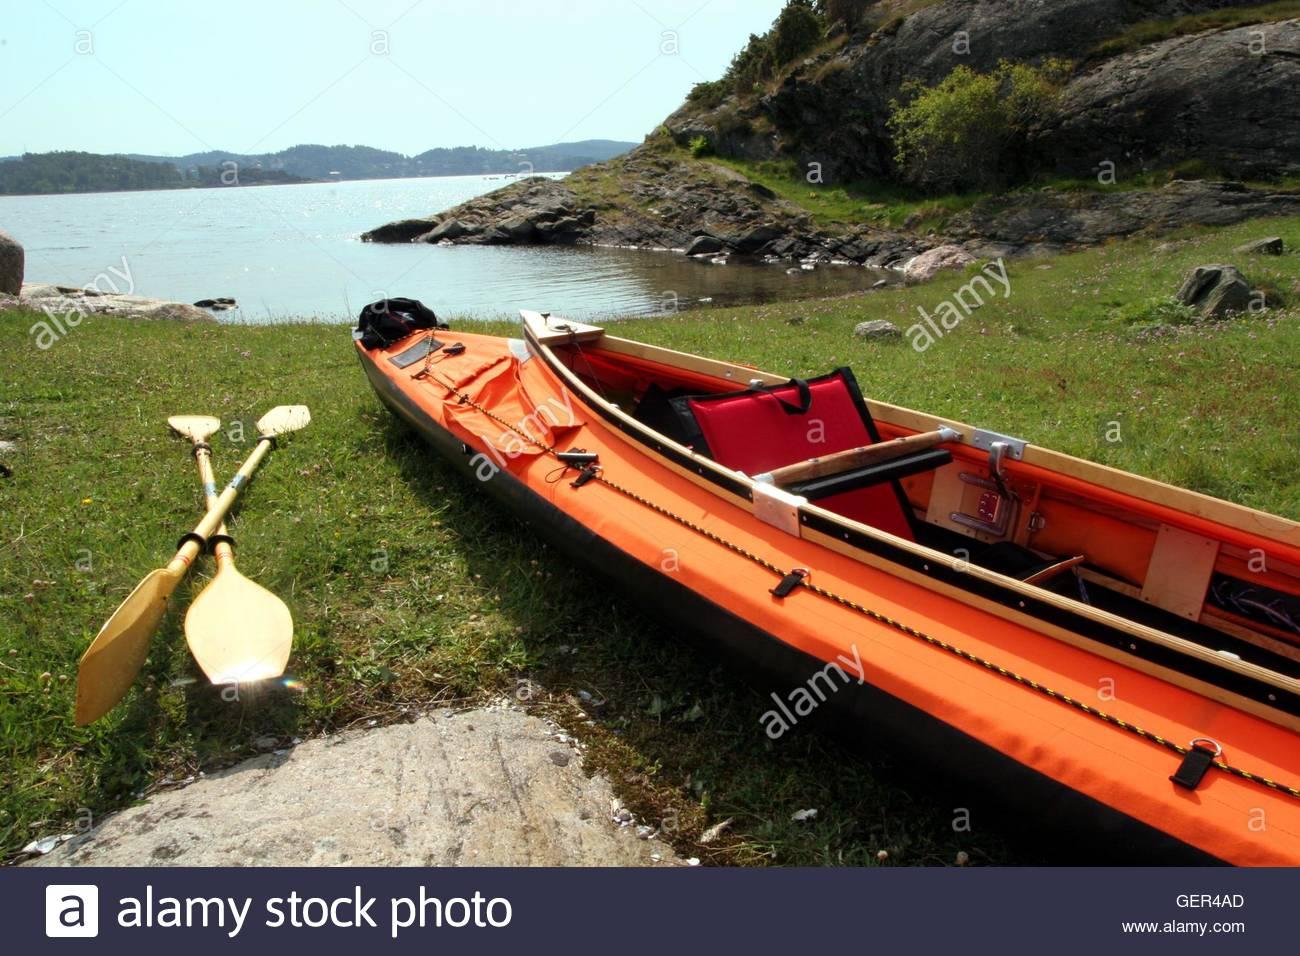 Sea kayak (faltboat) on a beach in Scandinavia